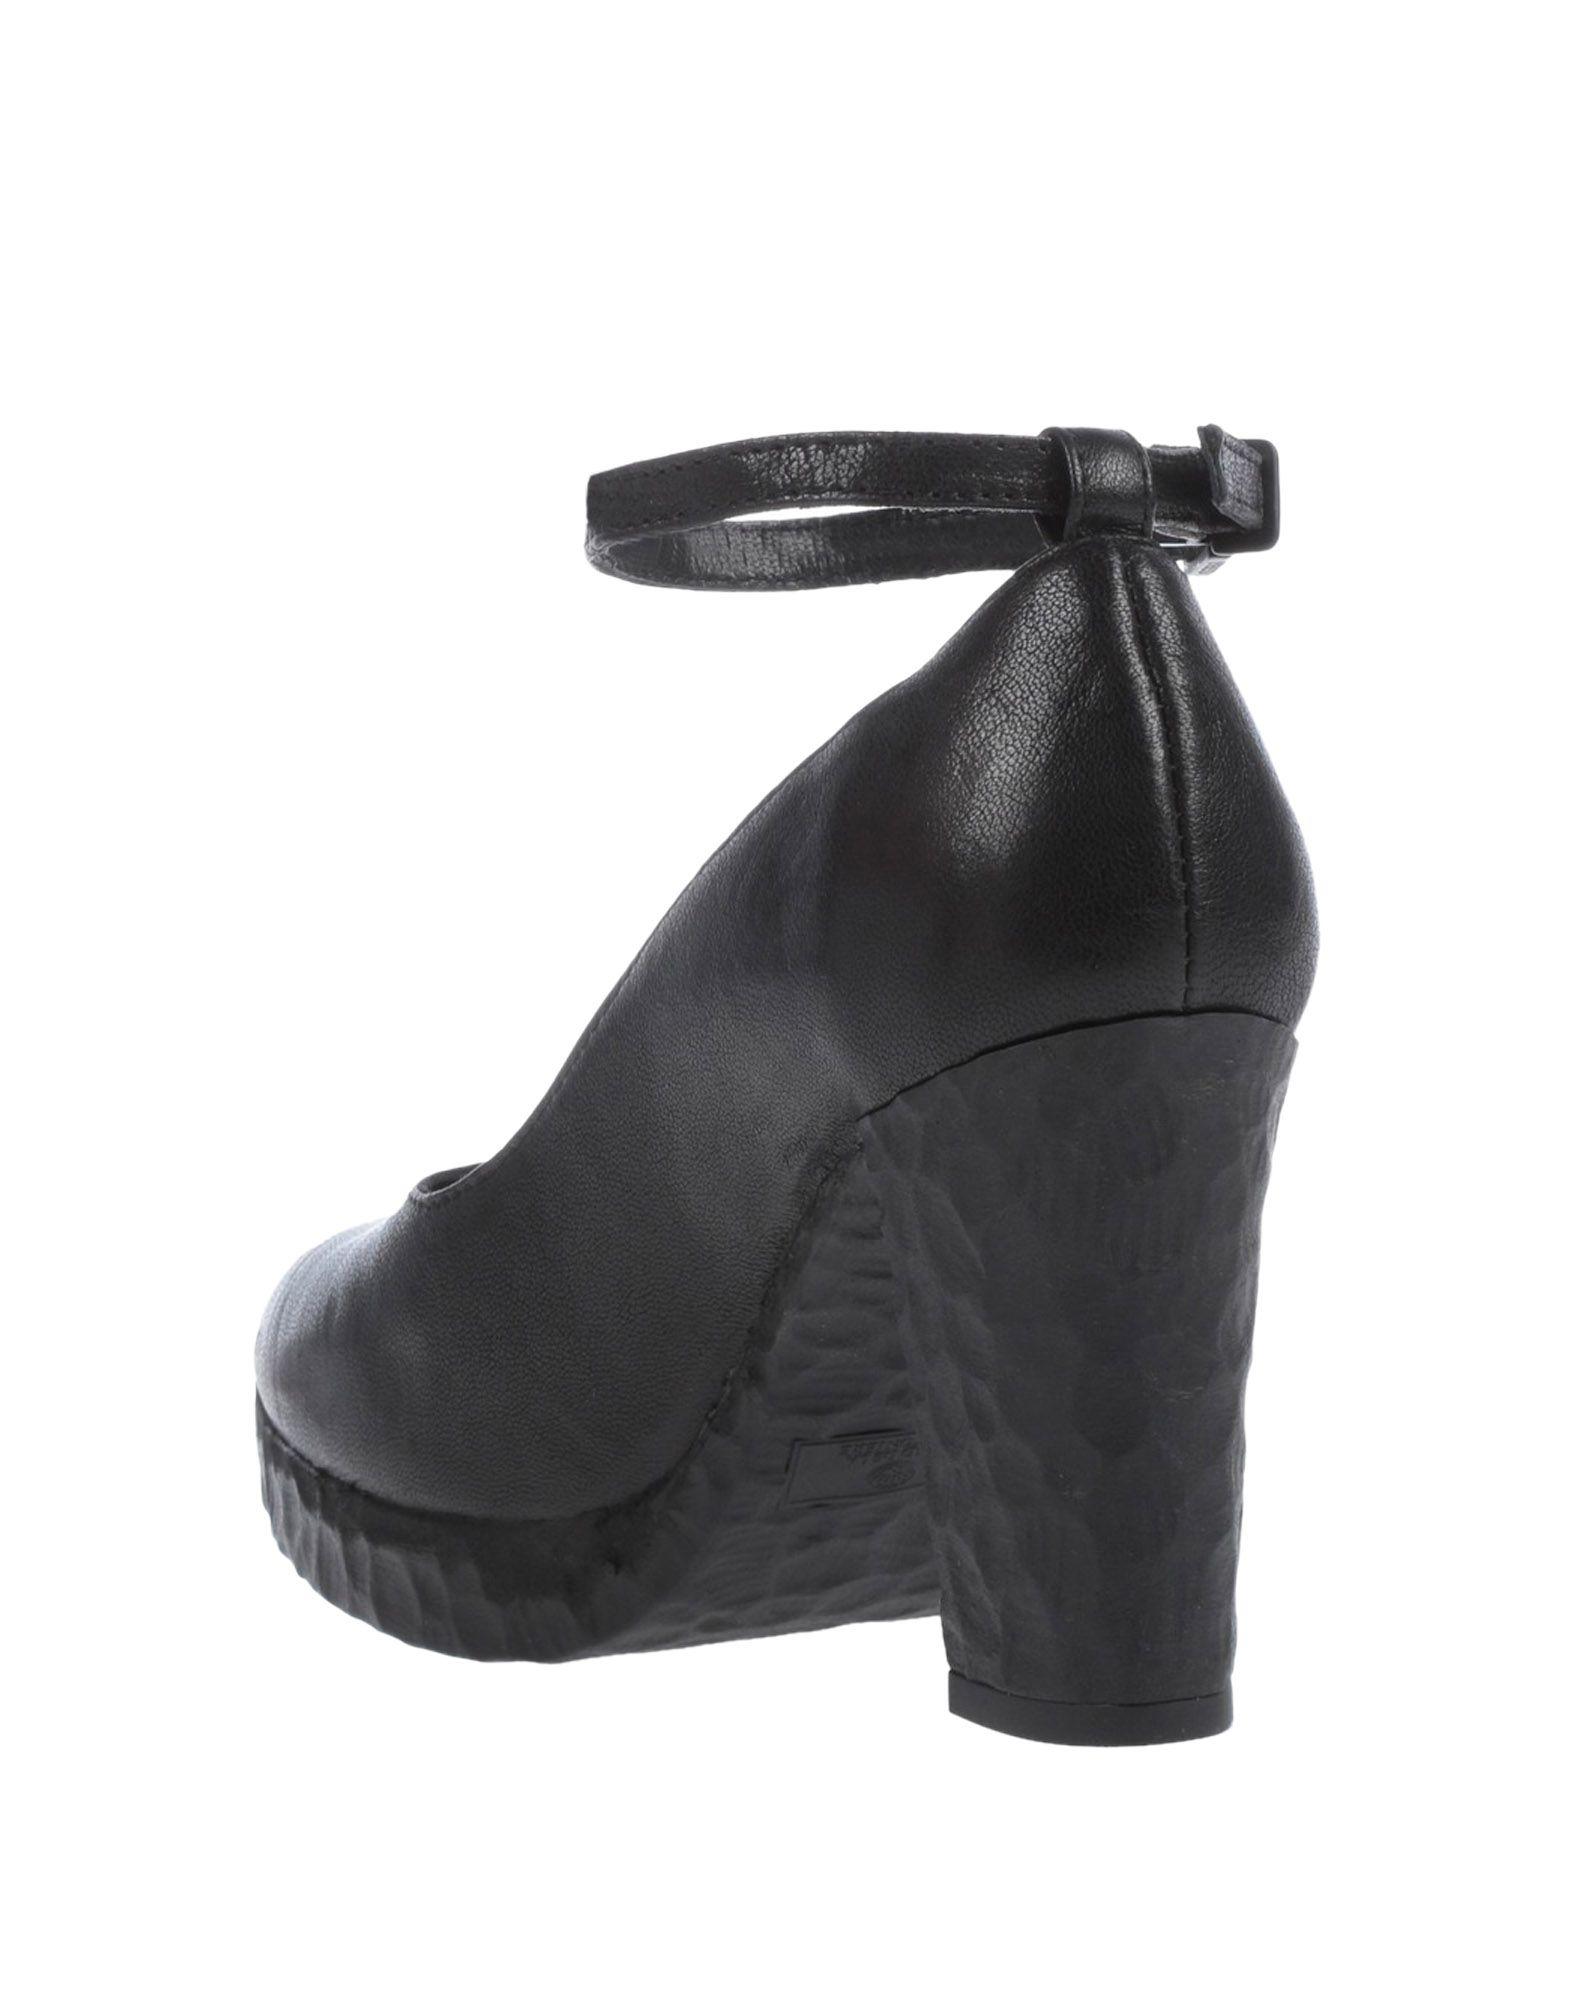 Gut Bretoniere um billige Schuhe zu tragenFred De La Bretoniere Gut Pumps Damen  11525727JP 4d455c